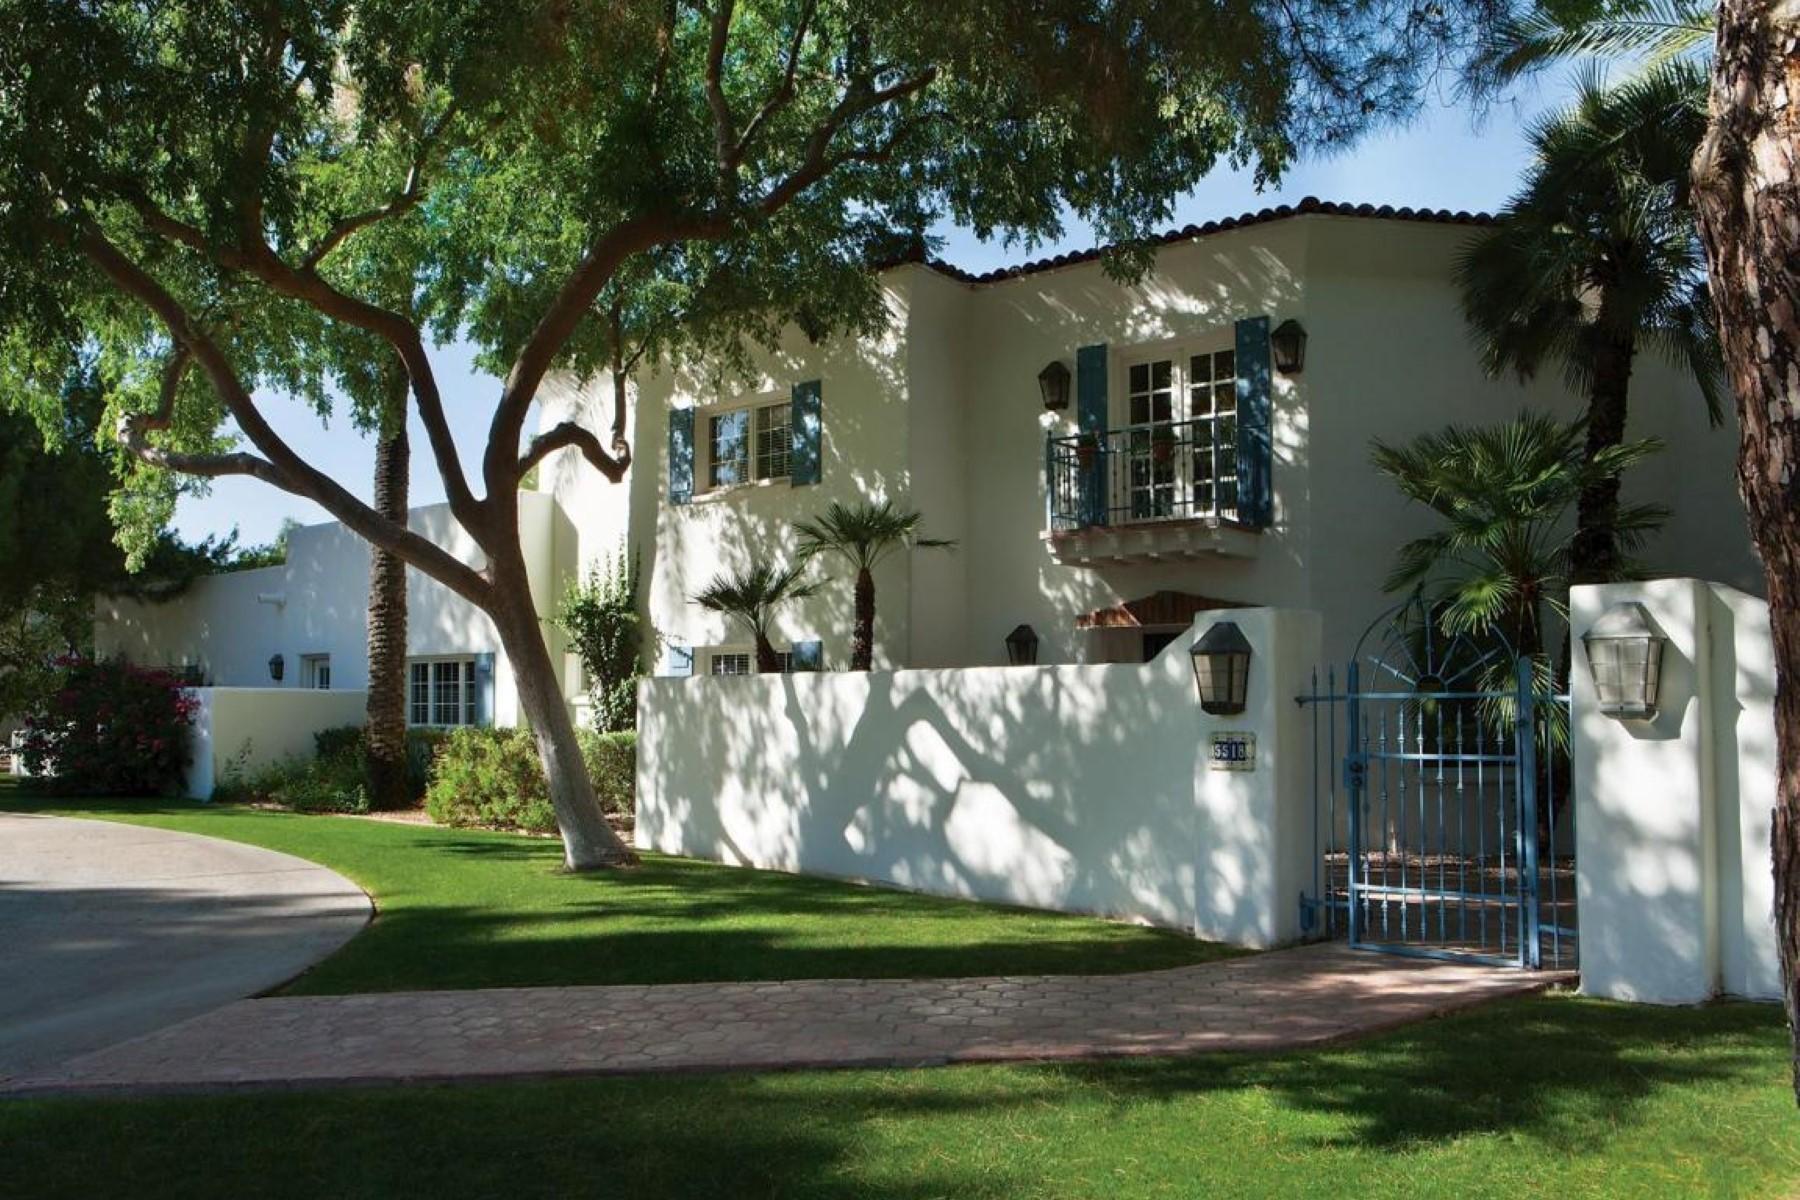 獨棟家庭住宅 為 出售 在 Romantically inspired Santa Barbara architecture 5518 E Sanna St Paradise Valley, 亞利桑那州, 85253 美國